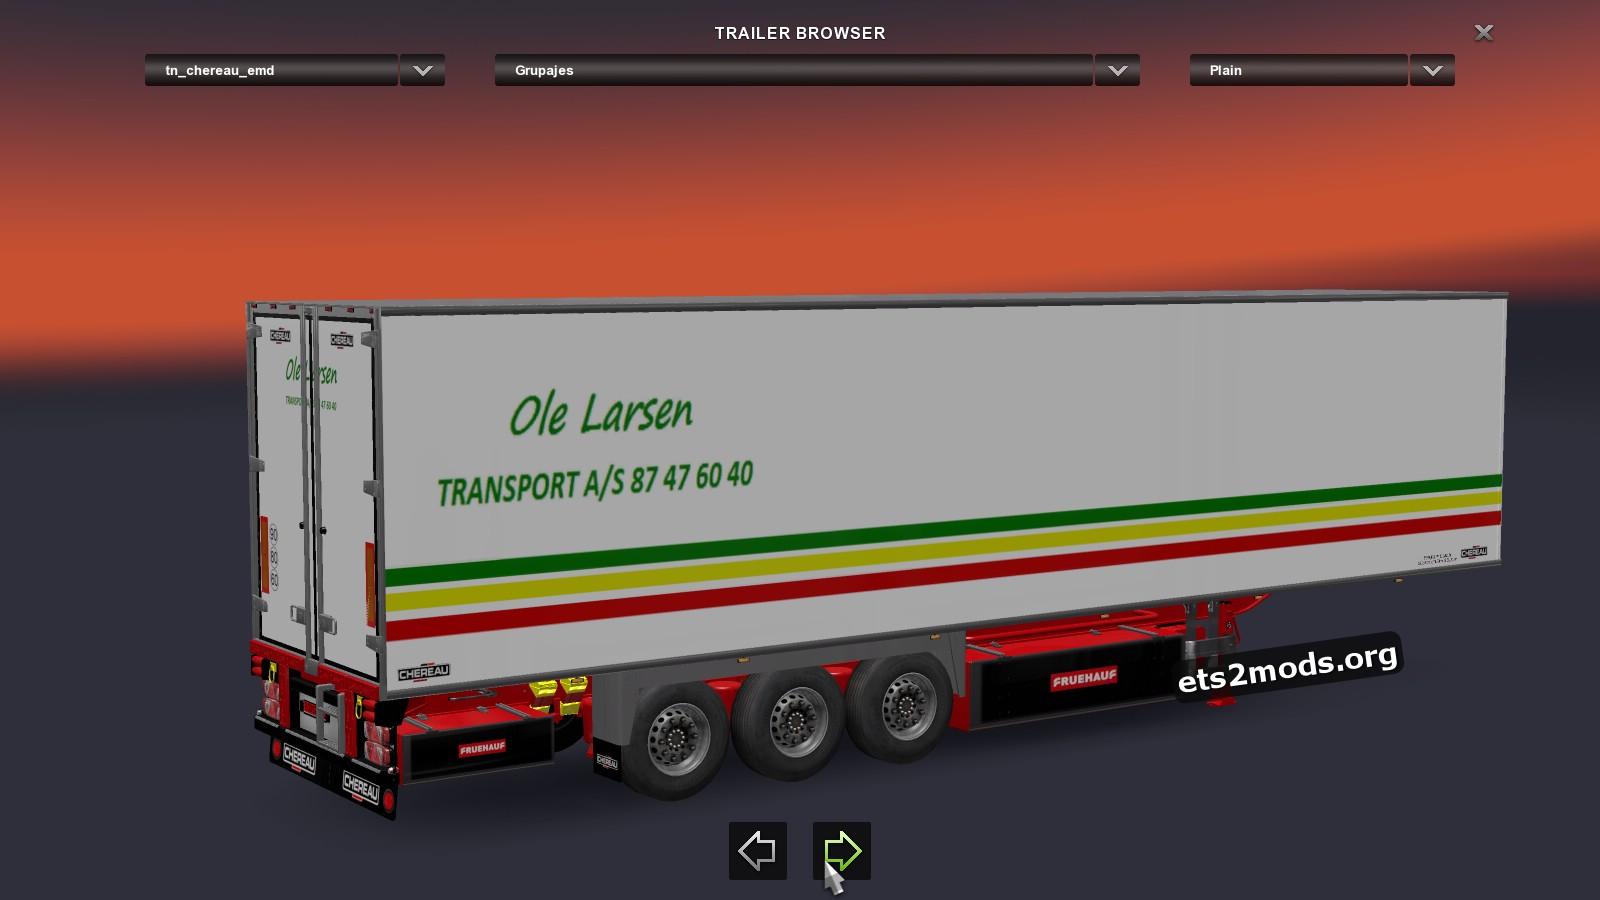 Trailer Ole Larsen